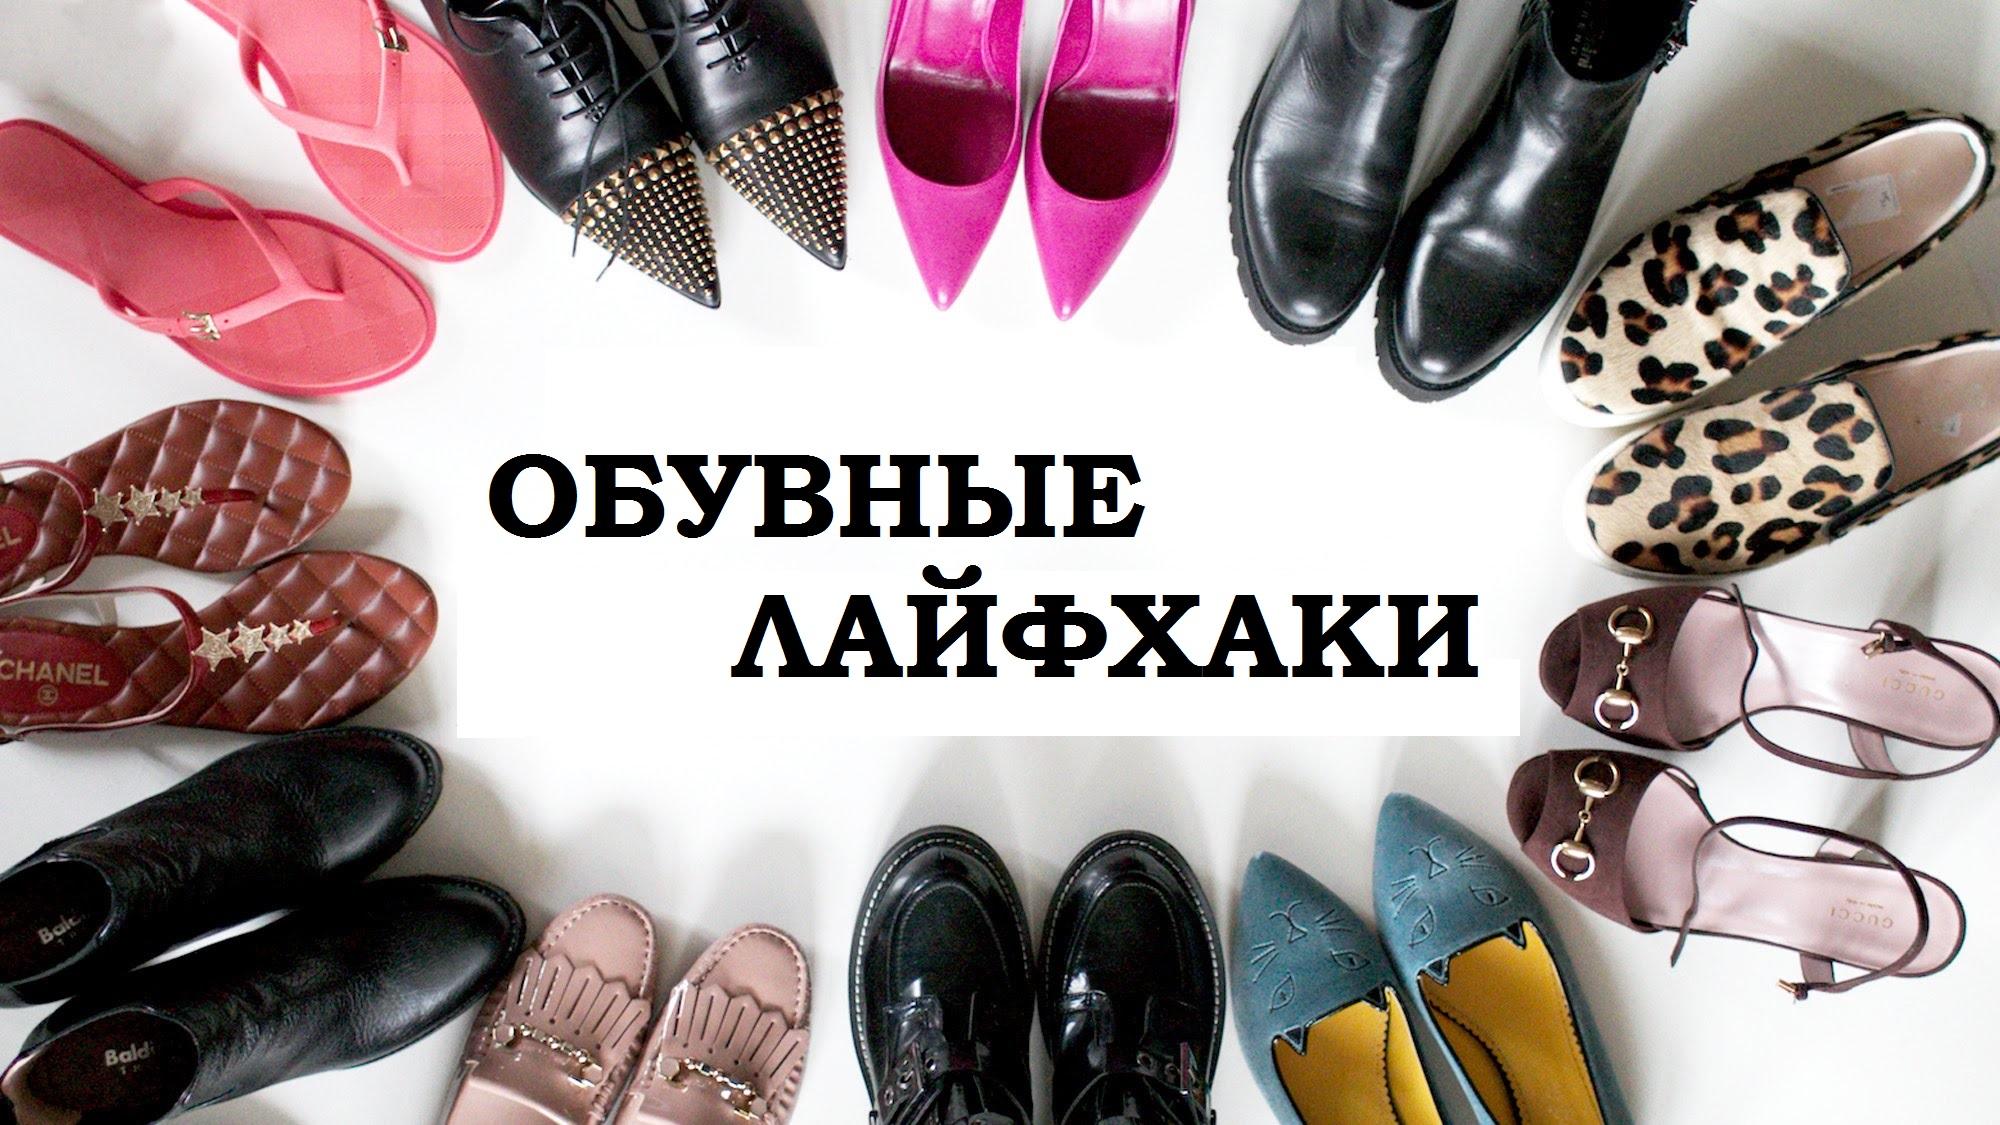 http://divamarket.ru/images/upload/ОБУВНЫЕ%20ЛАЙФХАКИ.jpg